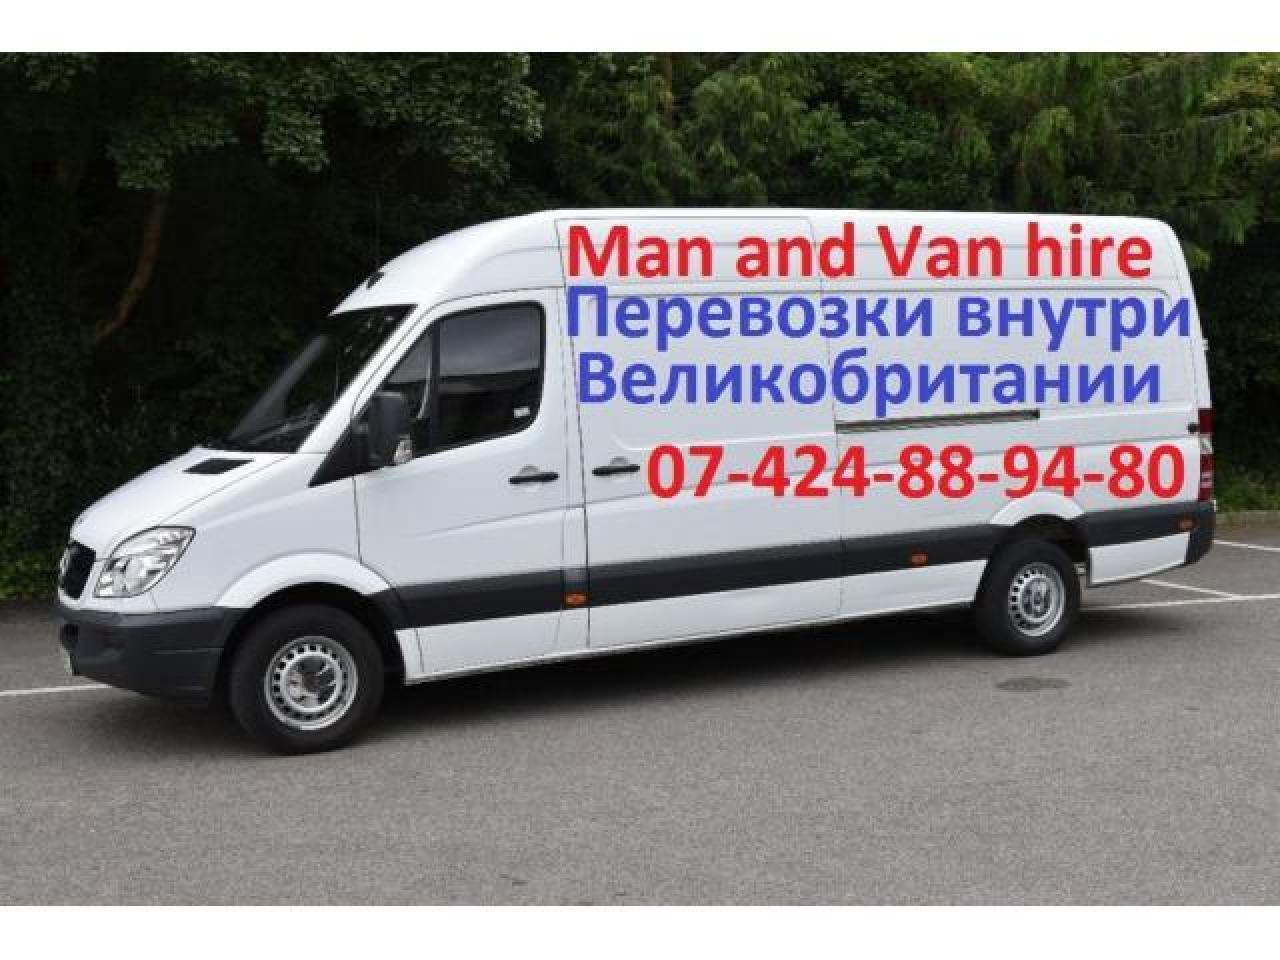 Man and Van hire - 1